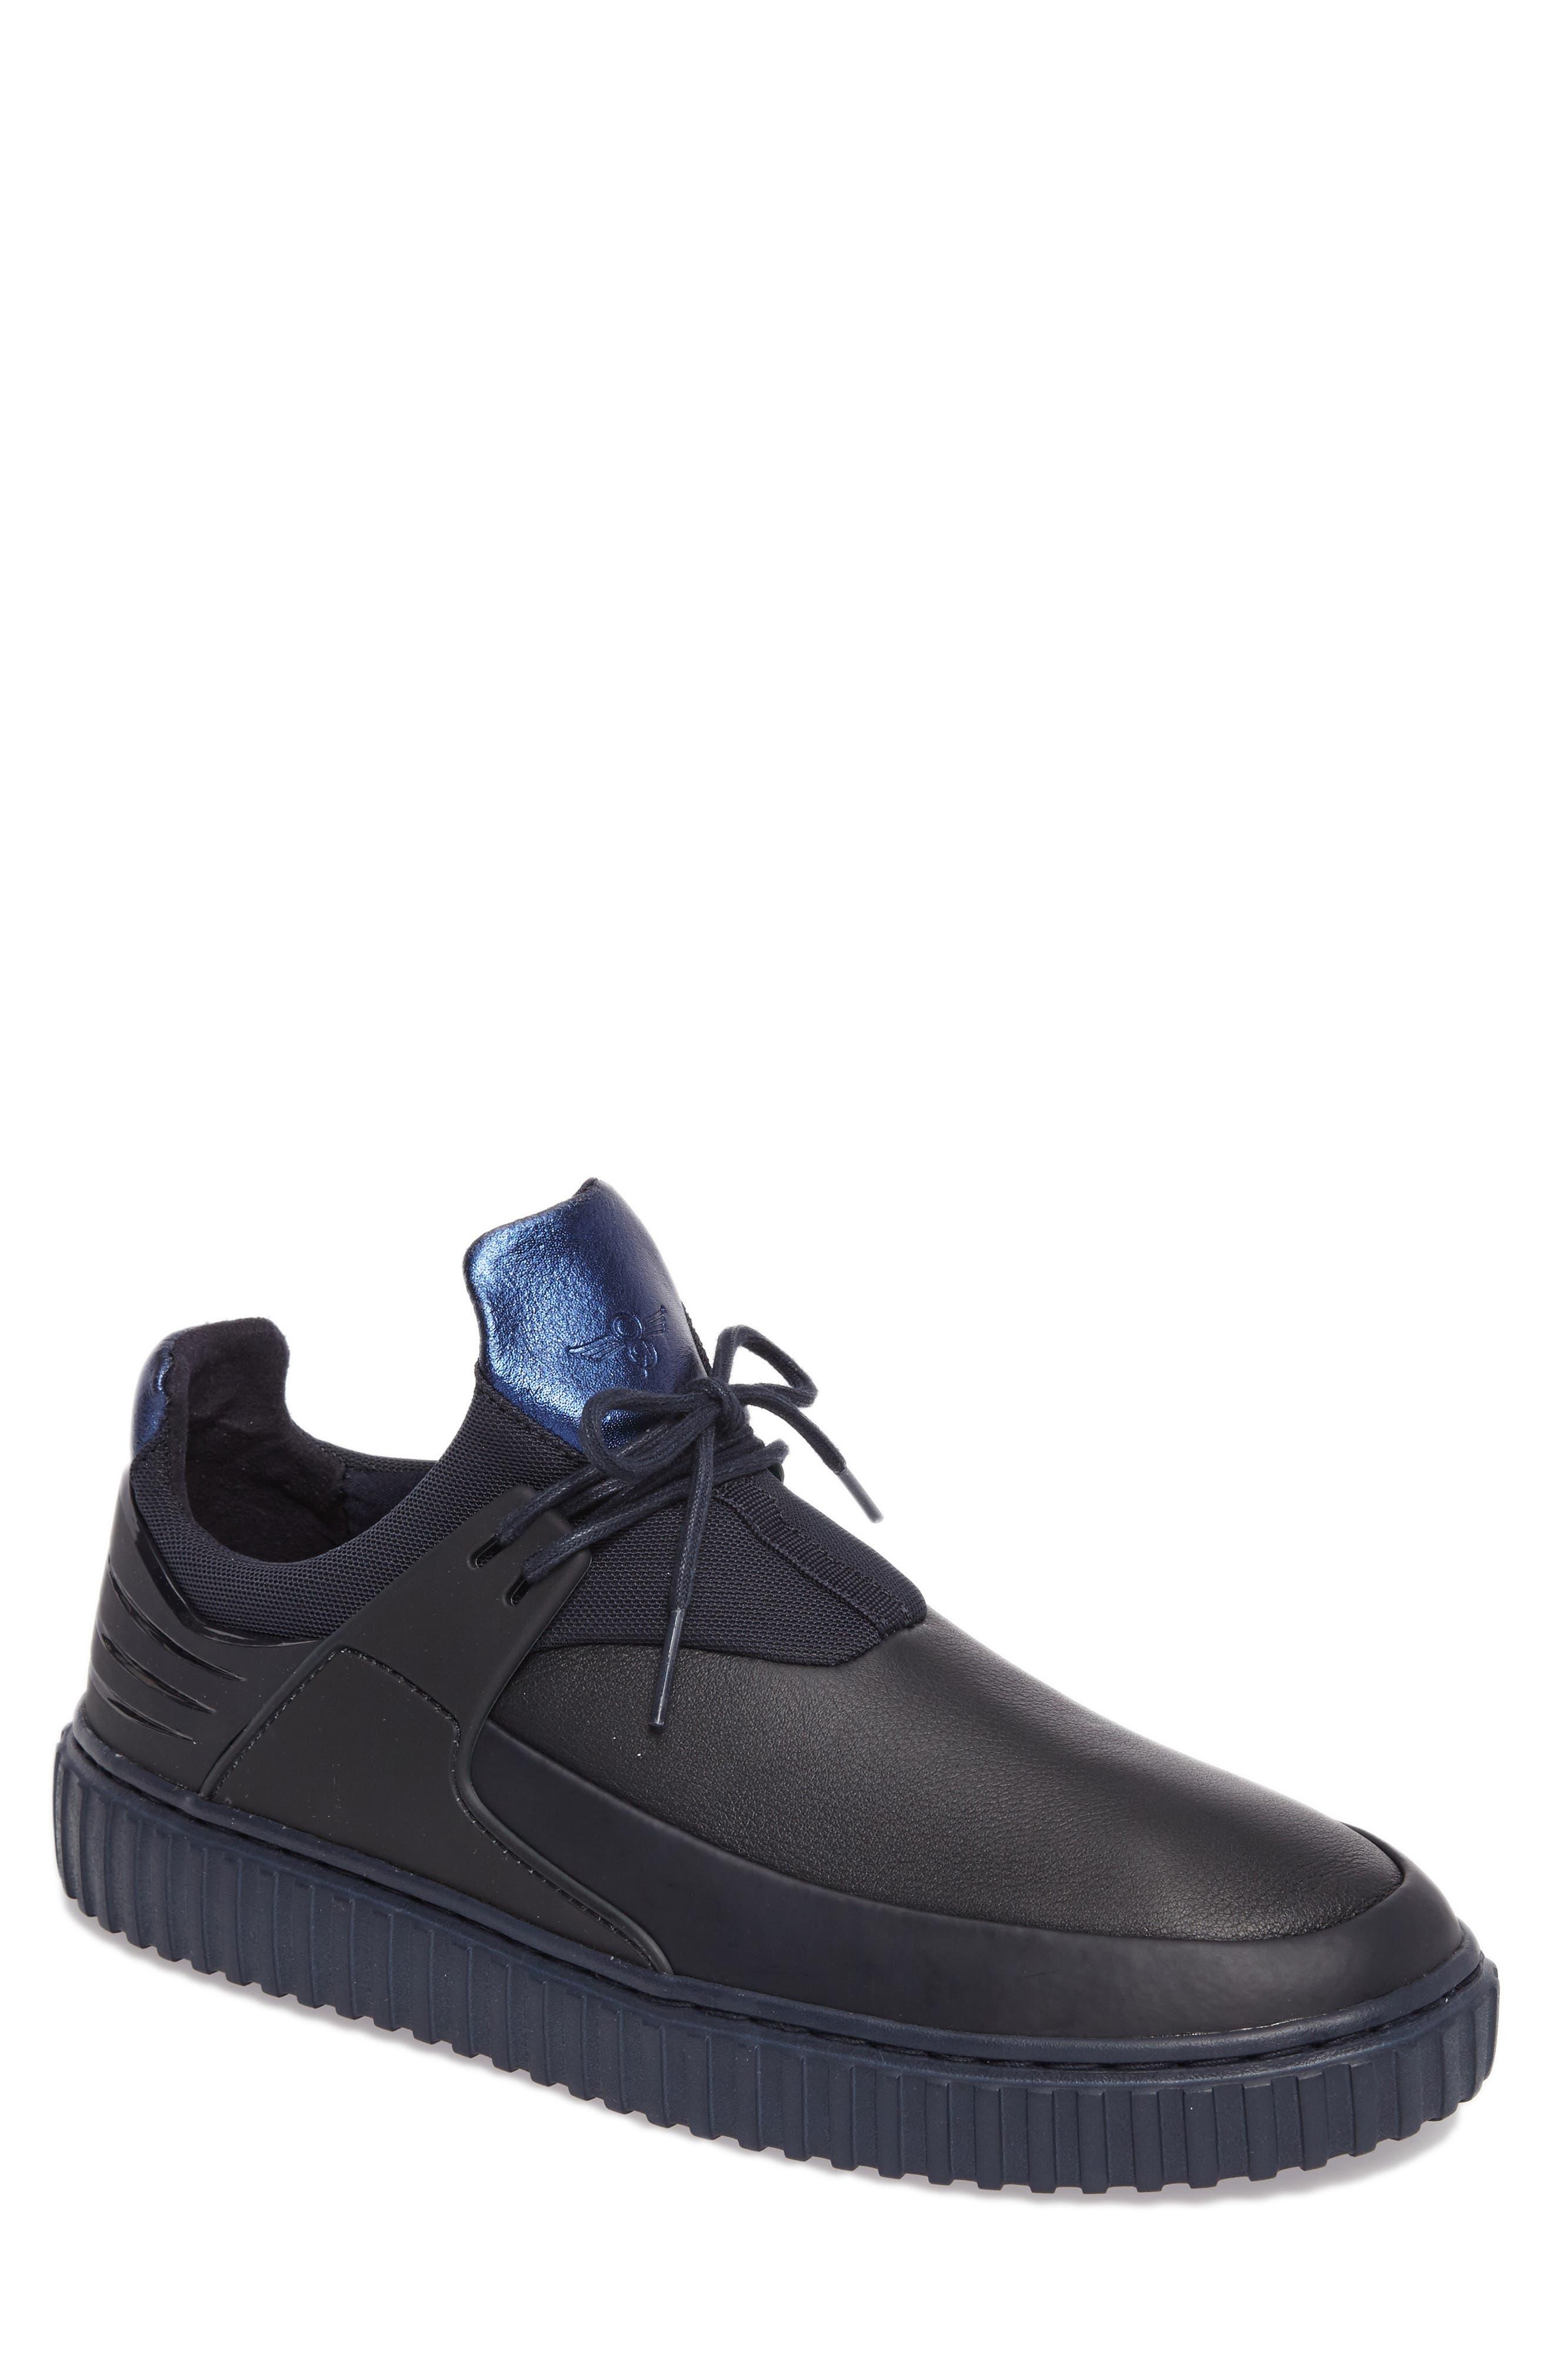 Alternate Image 1 Selected - Creative Recreation Castucci Mid Sneaker (Men)